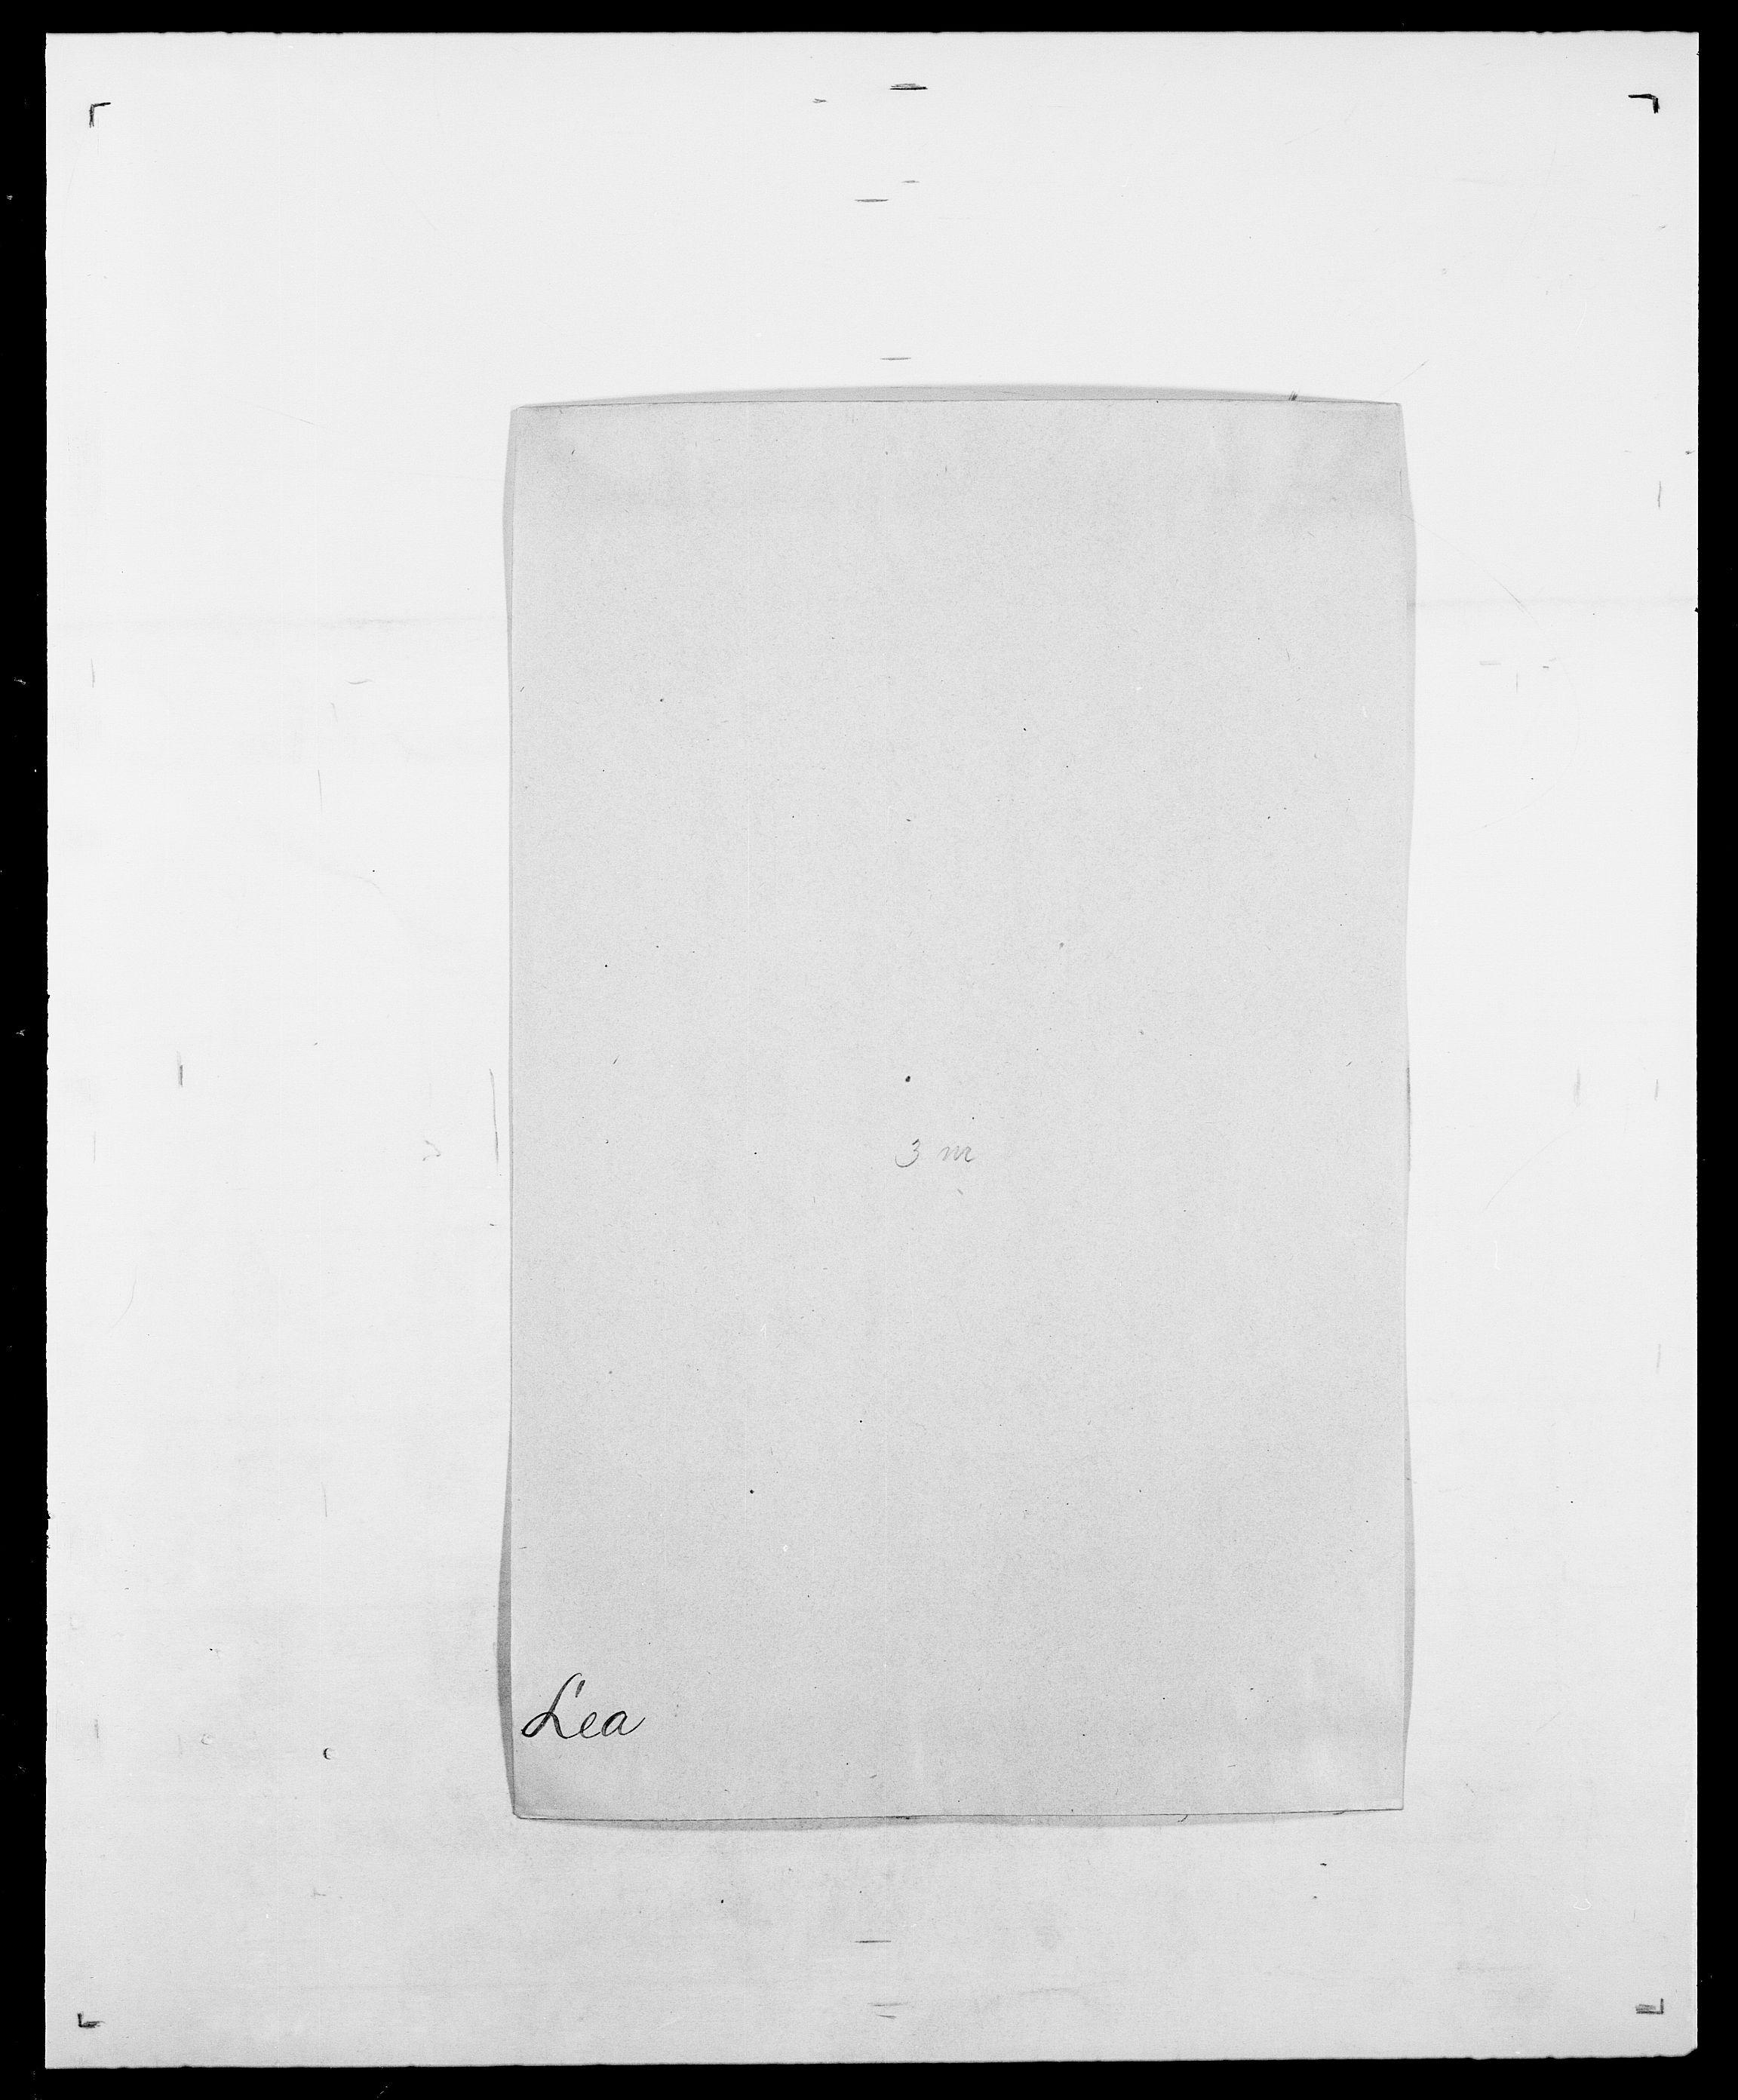 SAO, Delgobe, Charles Antoine - samling, D/Da/L0023: Lau - Lirvyn, s. 43